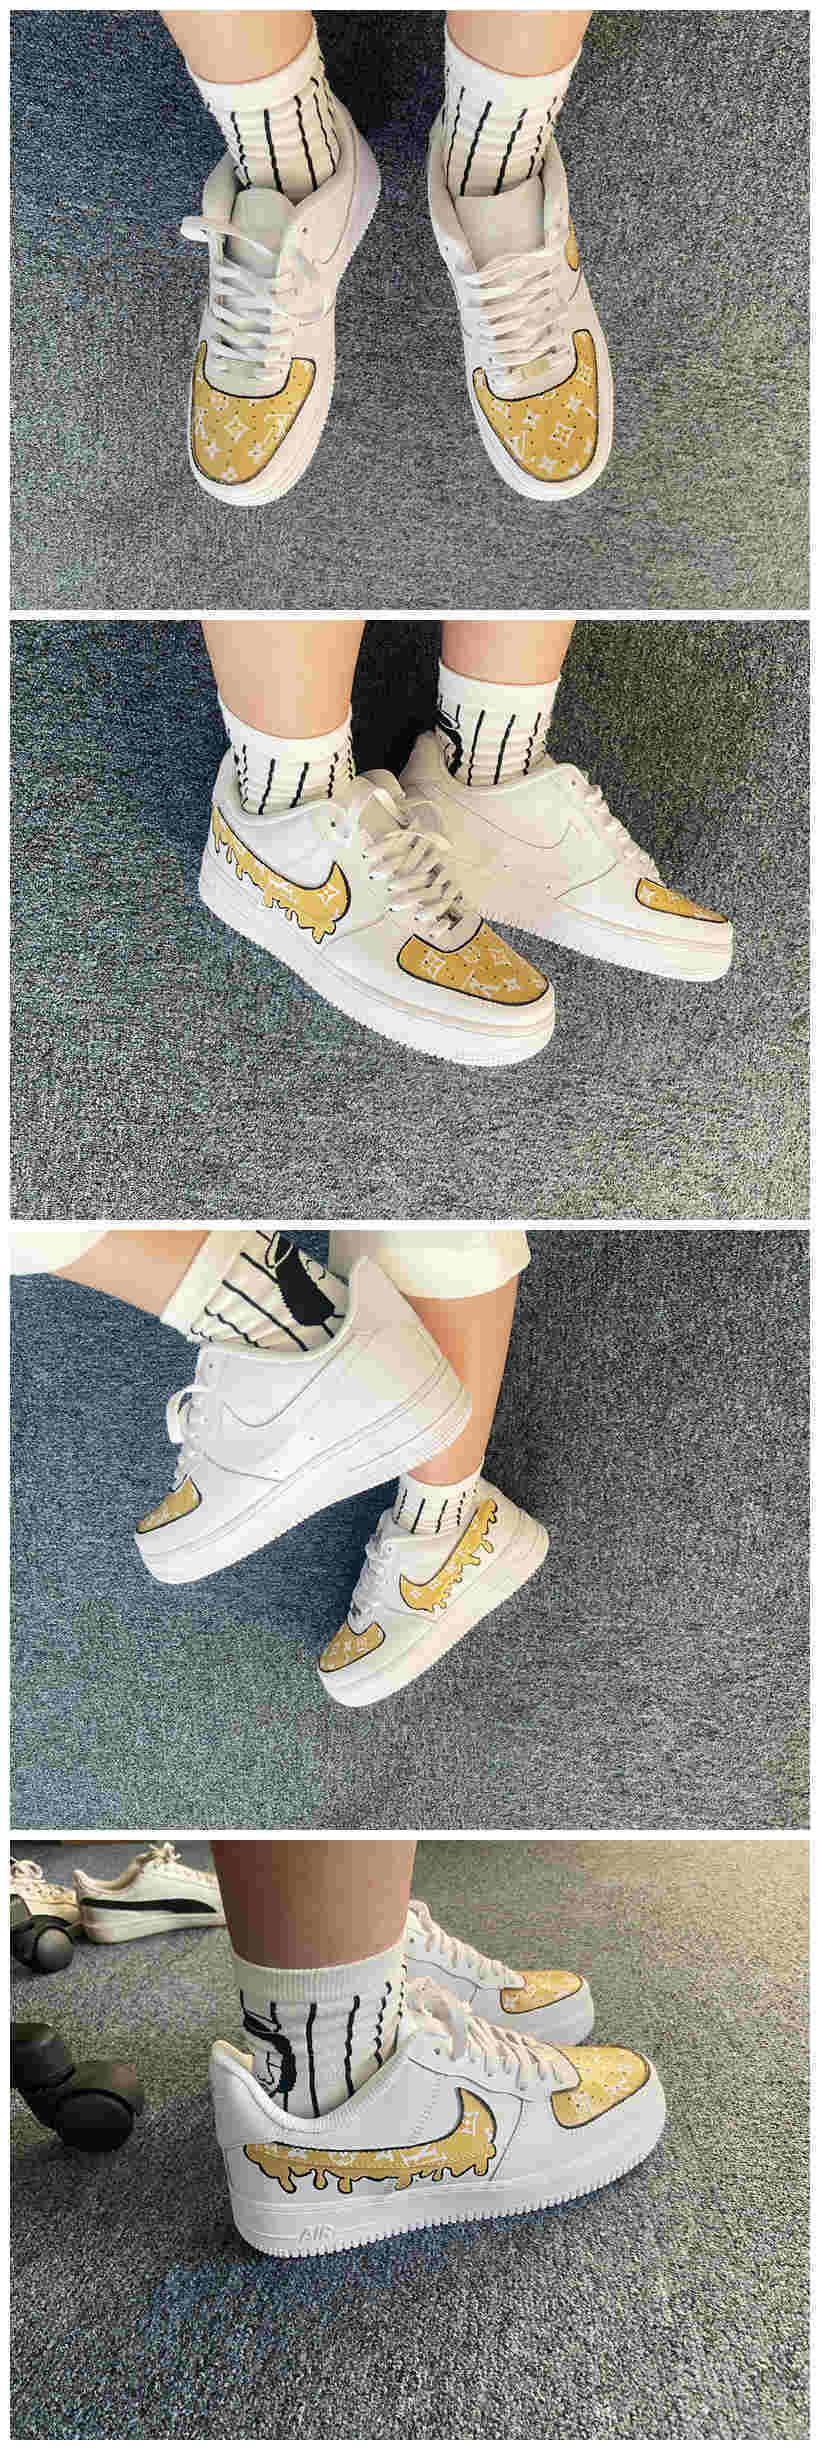 Custom Louis Vuitton Shoes For Air Force 1 White Graffiti Hand Painted Sneaker-A007Custom Louis Vuitton Shoes For Air Force 1 White Graffiti Hand Painted Sneaker - A007 - The Zero Custom